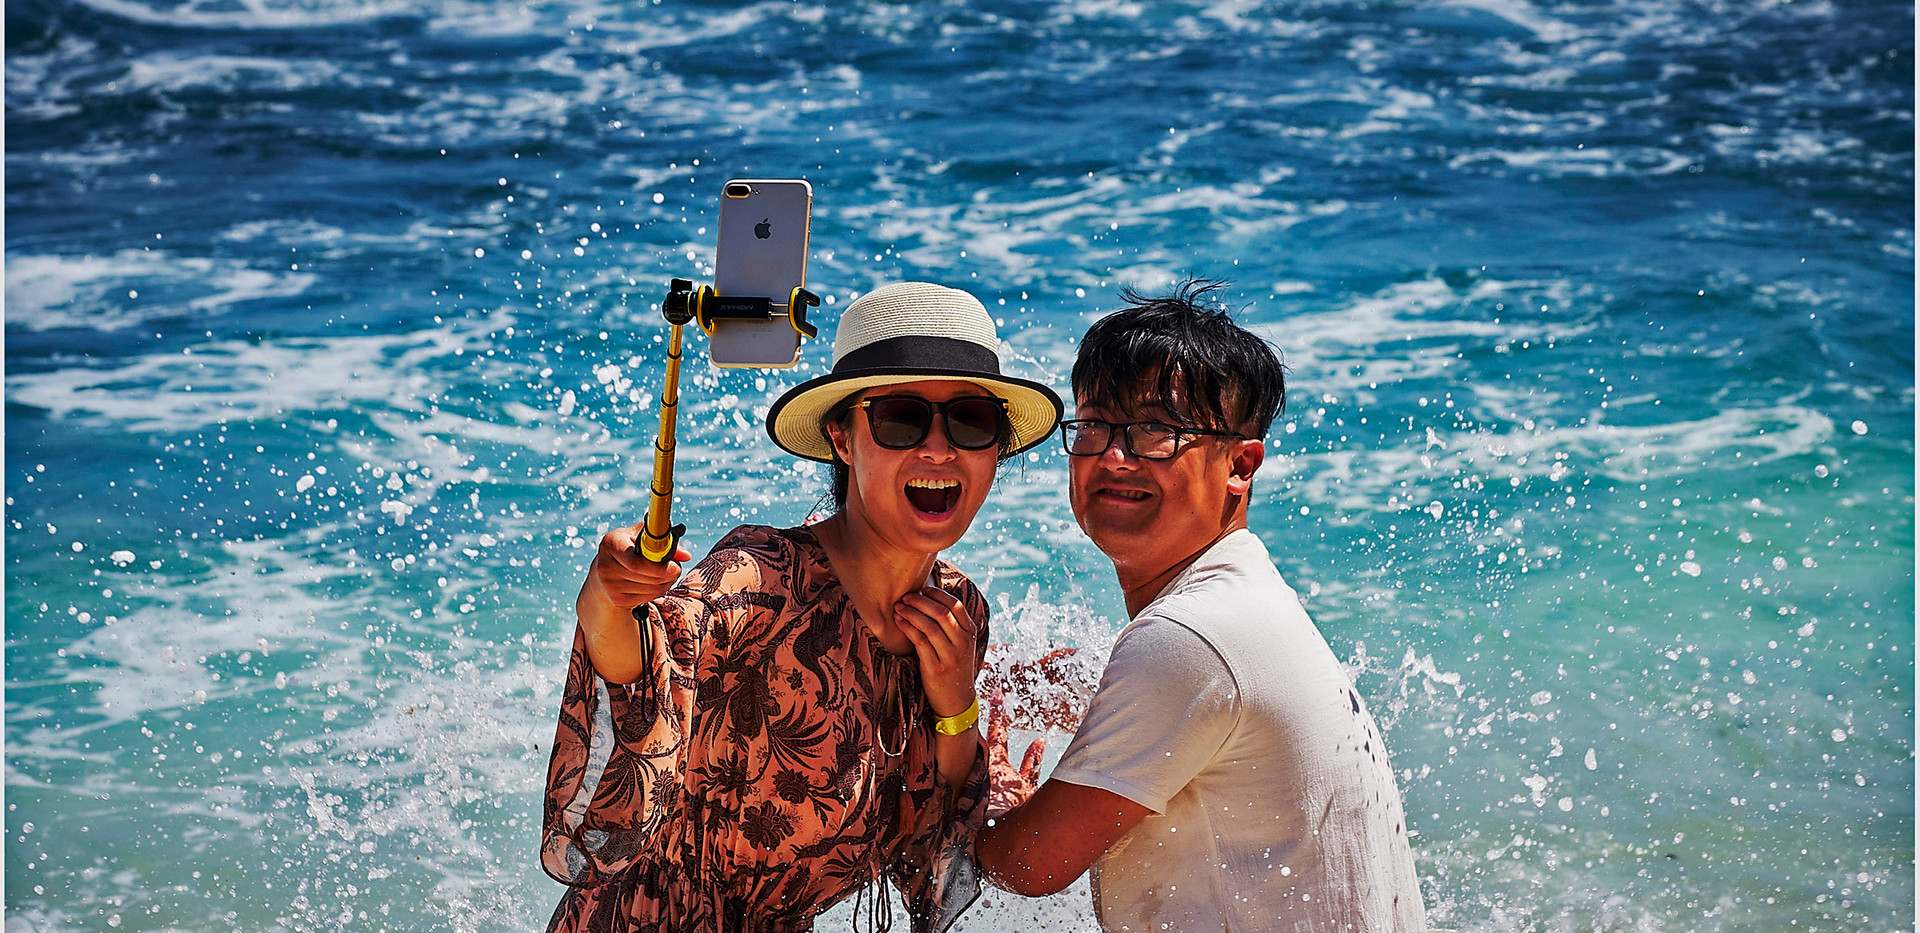 Copy of Bali_2017_106550.jpg